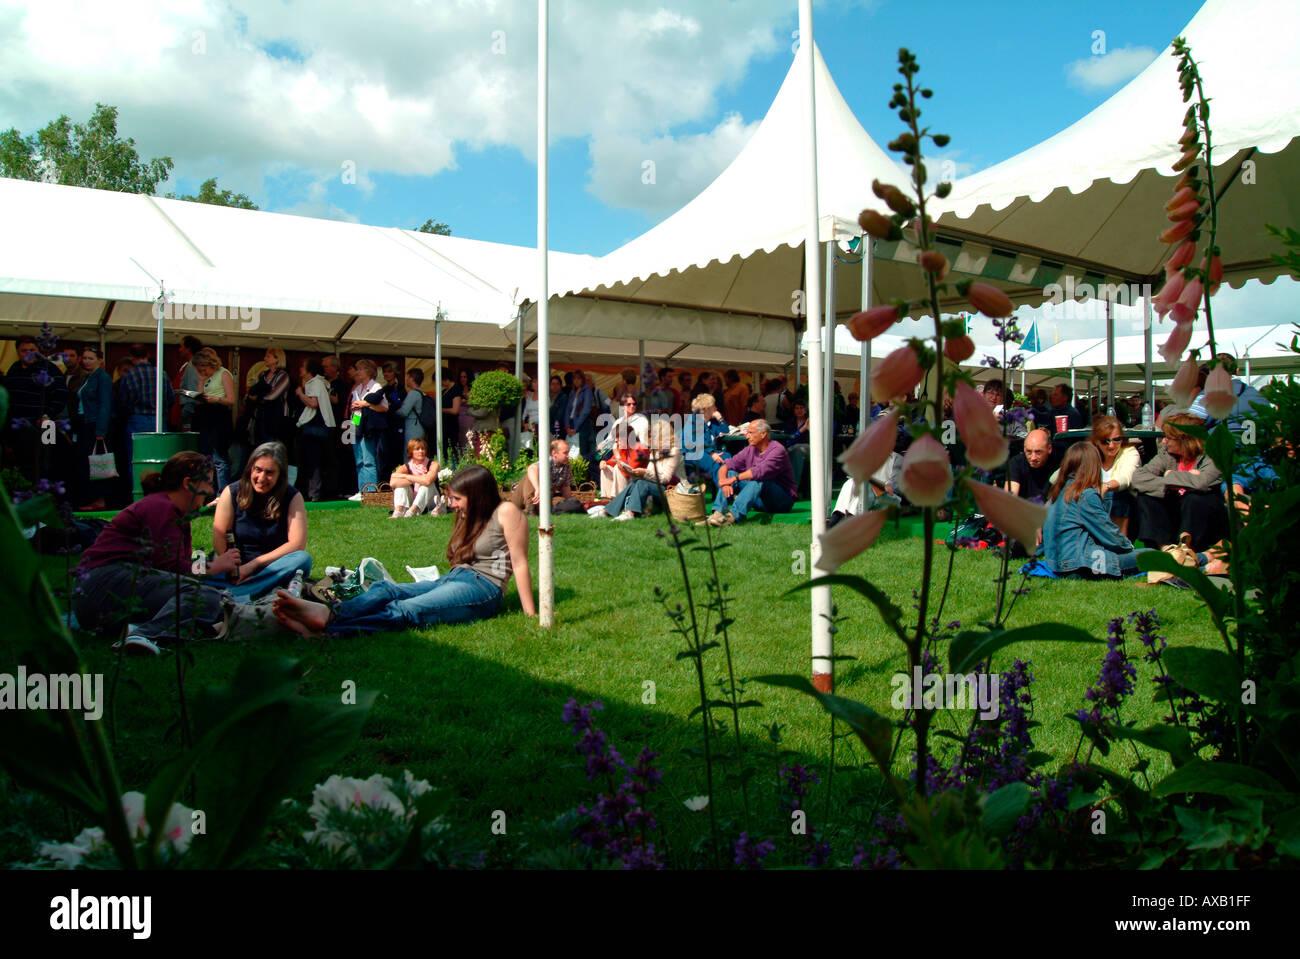 Hay on Wye book festival Wales UK - Stock Image